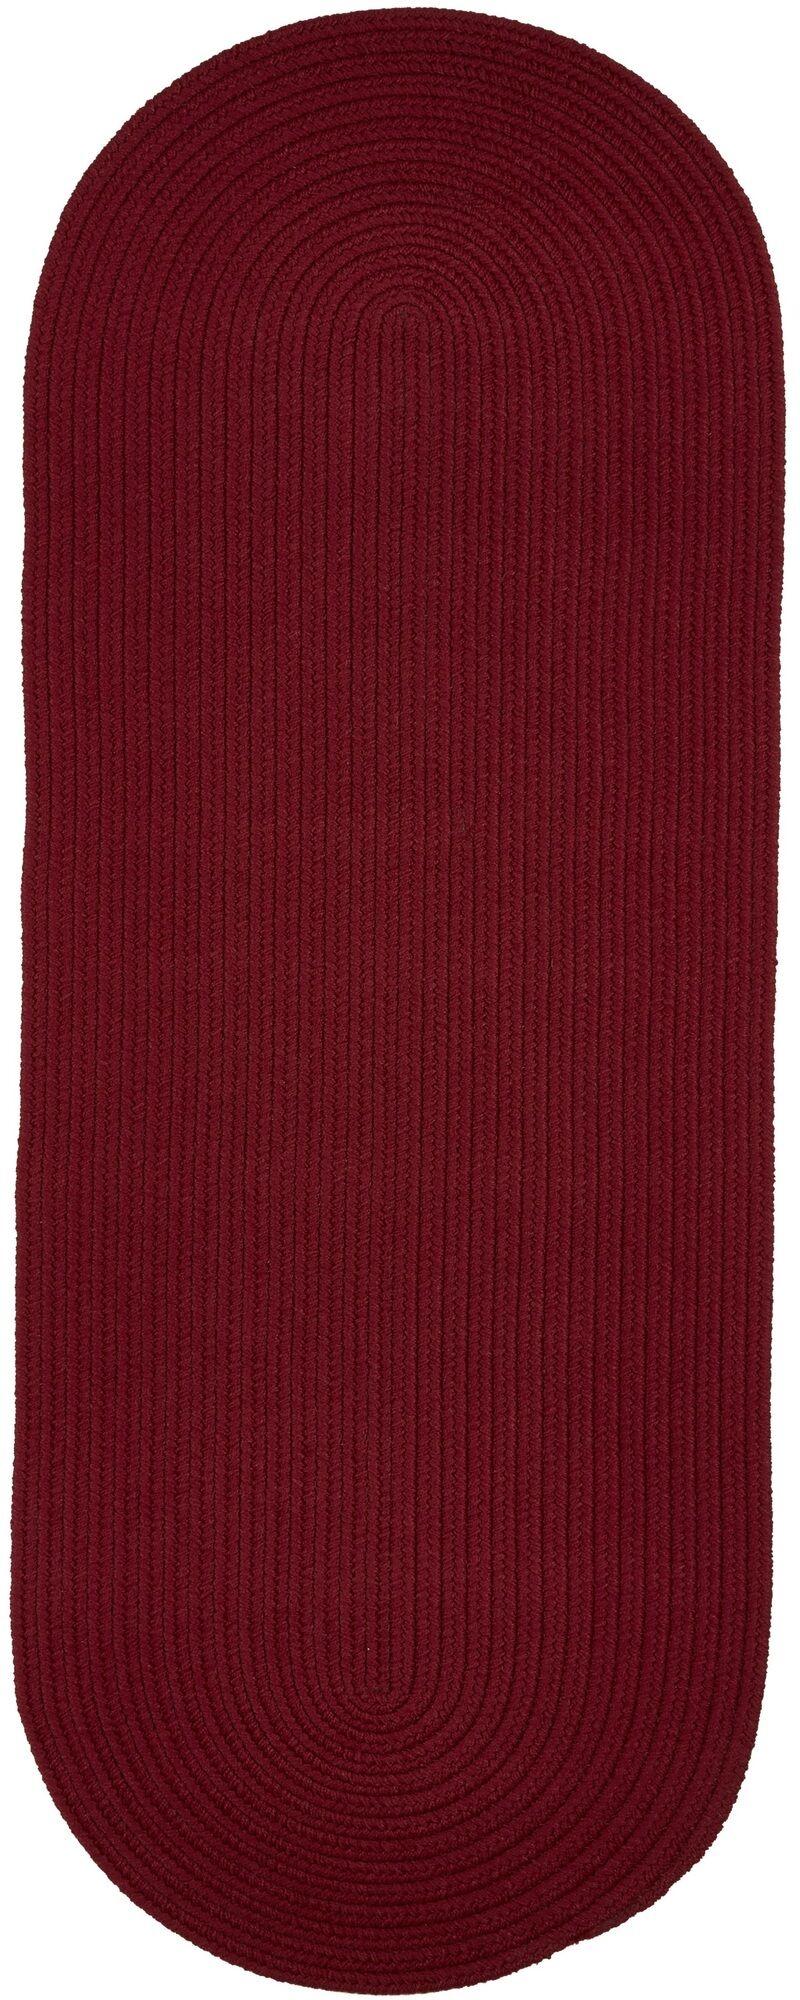 Handmade Colonial Red Indoor/Outdoor Area Rug Rug Size: Runner 2' x 6'